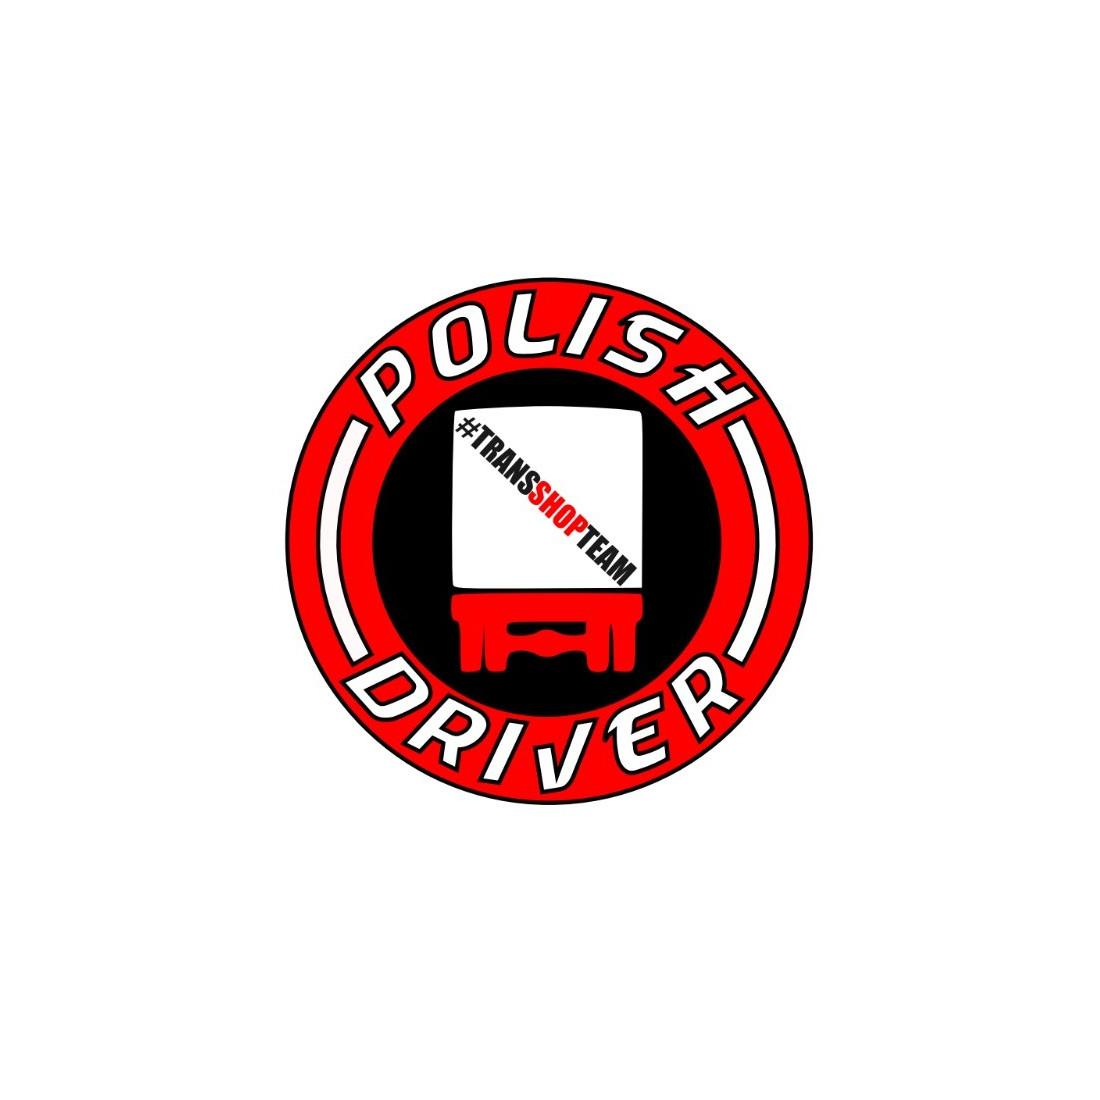 POLISH DRIVER STICKER 10 CM